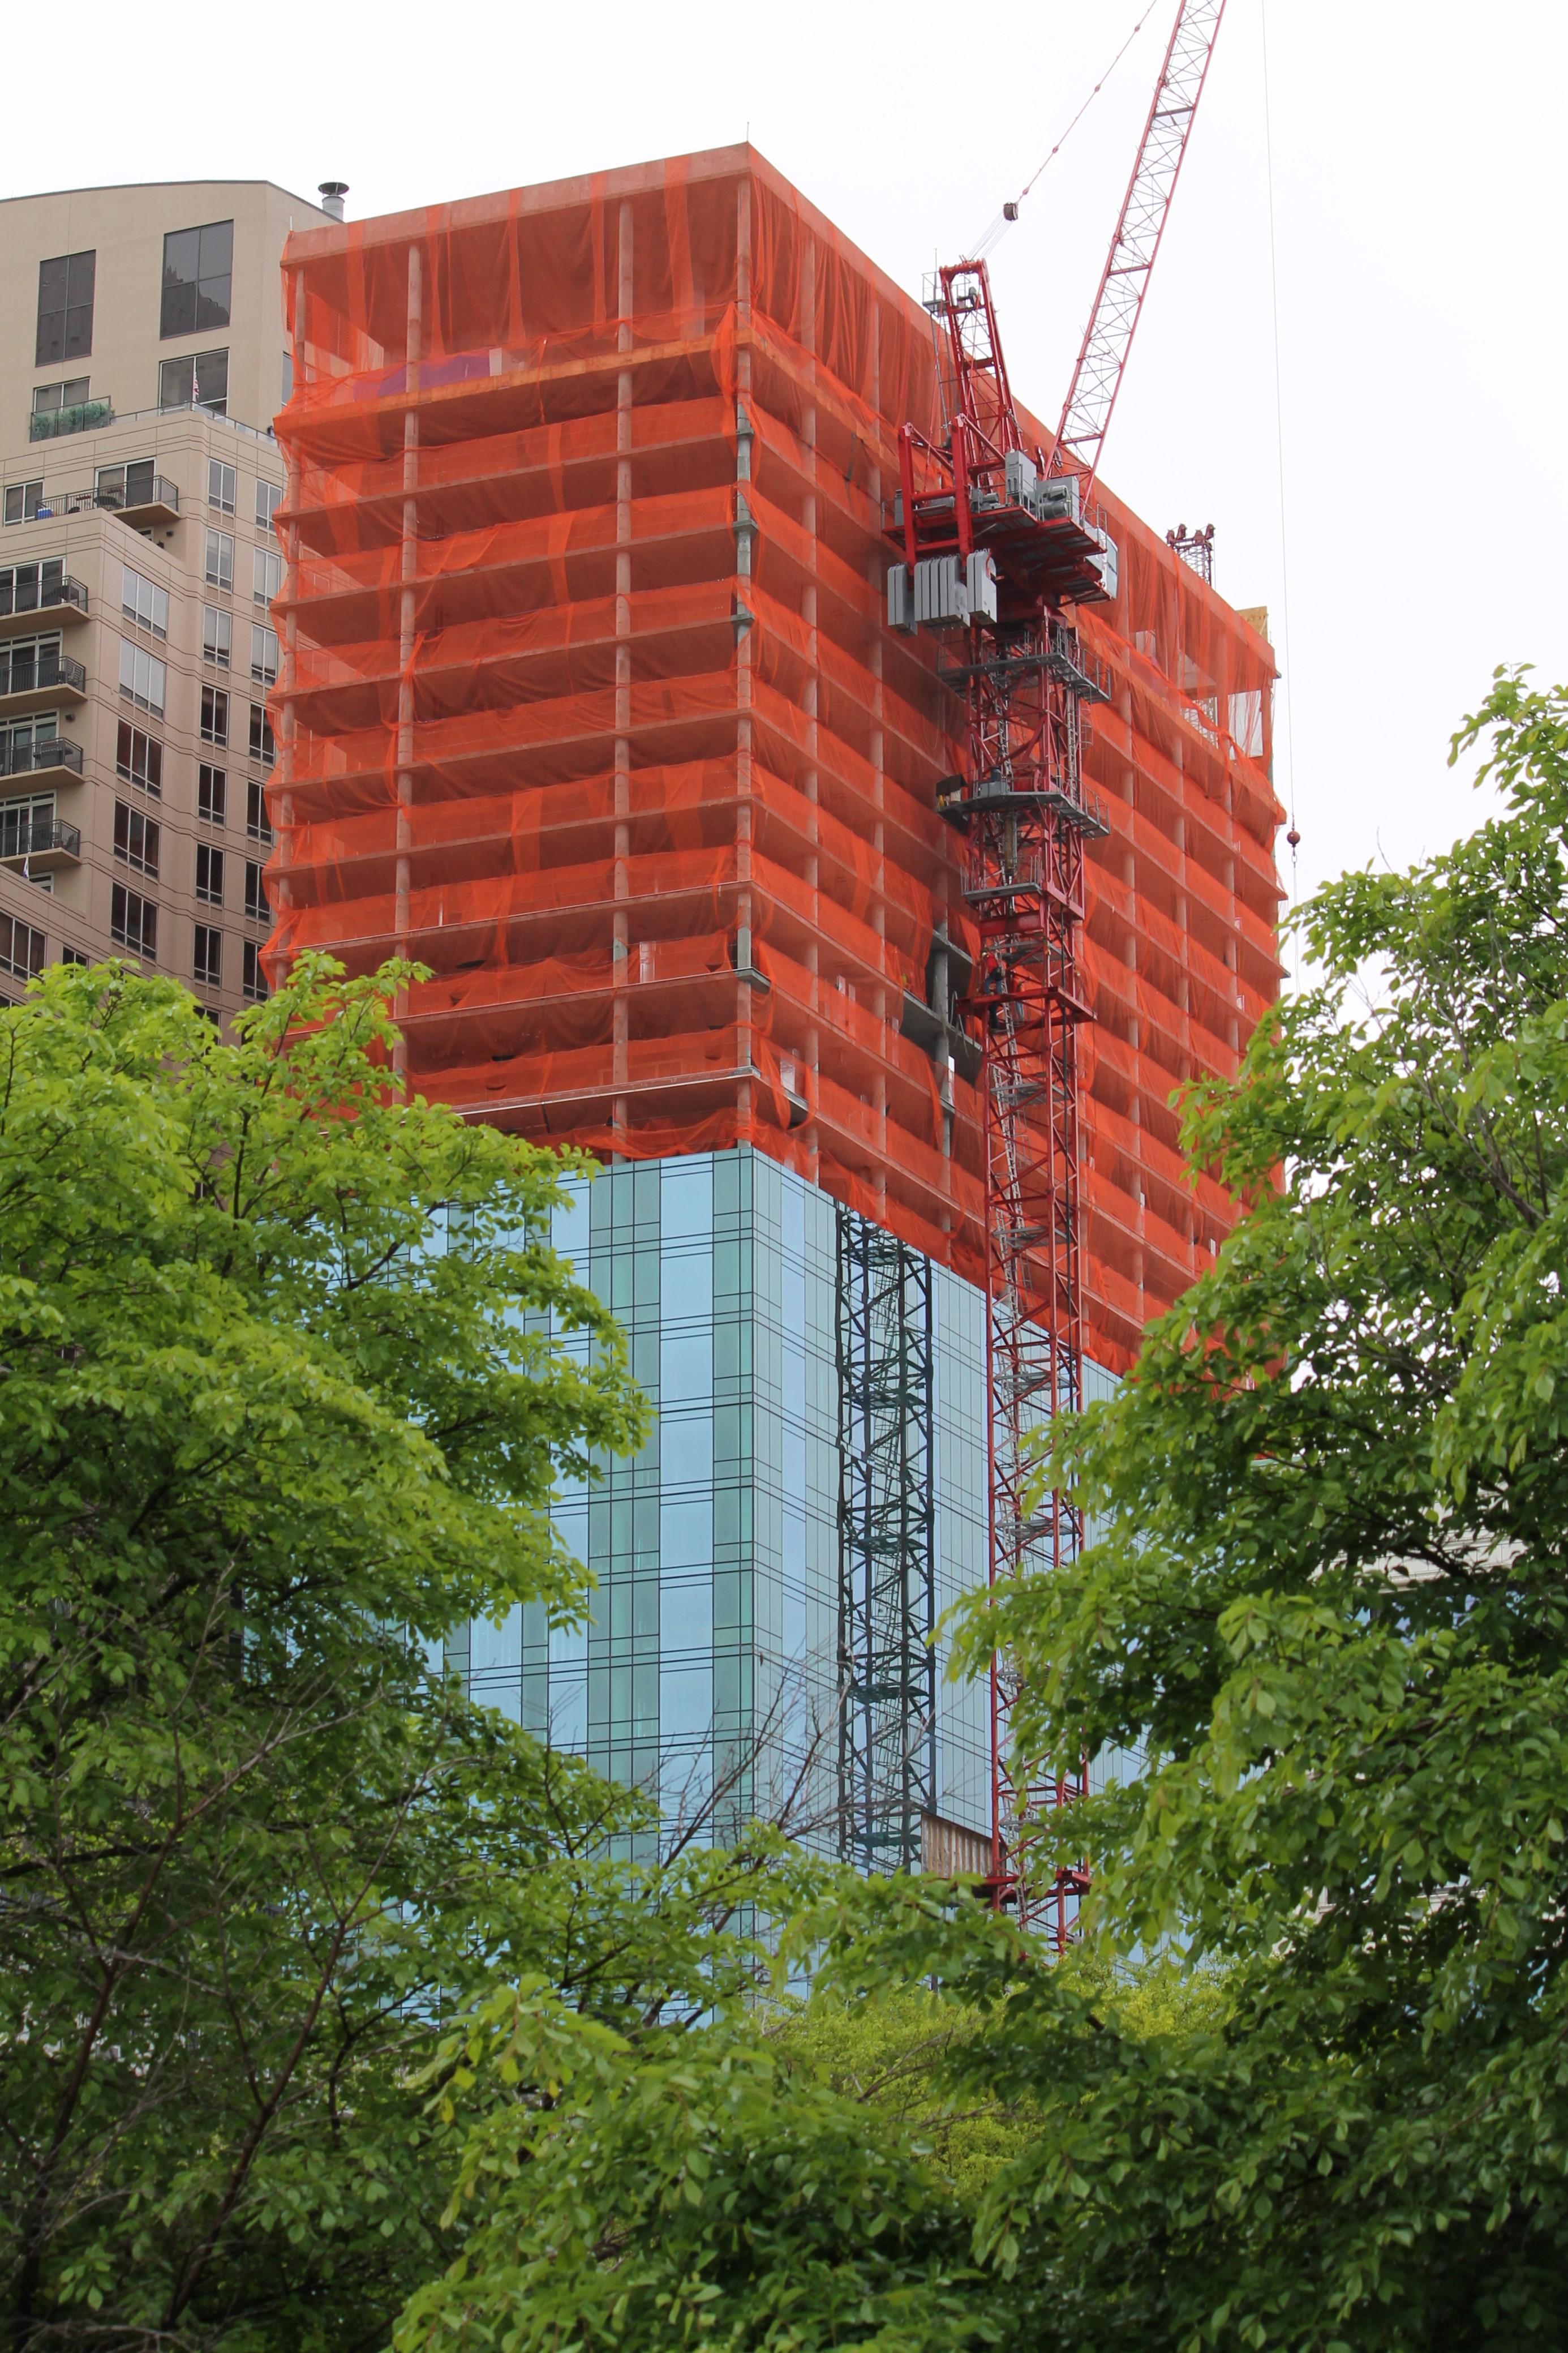 1101 South Wabash crane removal